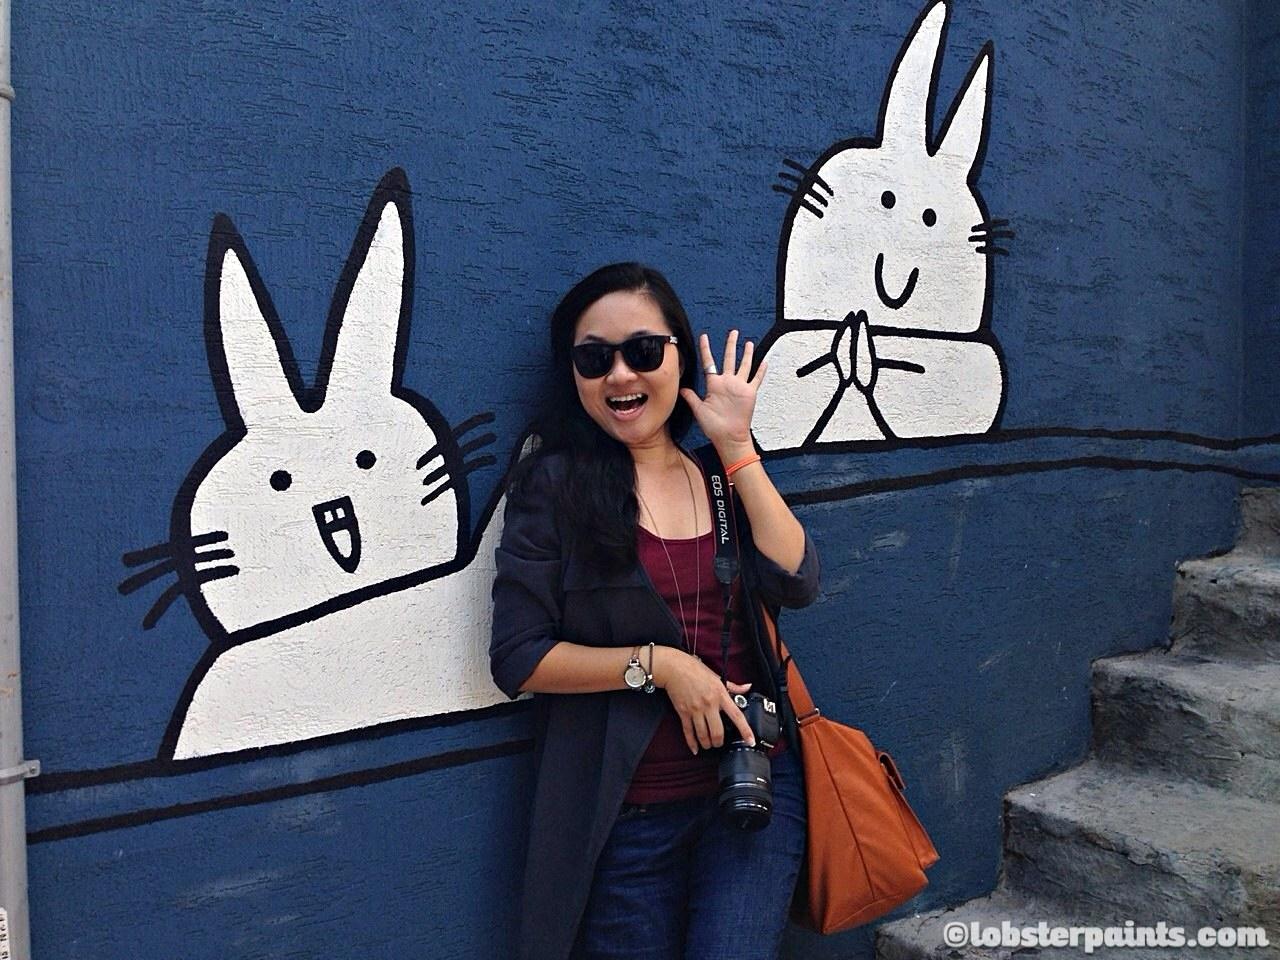 3 Oct 2014: Ihwa Mural Village 이화벽화마을 | Seoul, South Korea